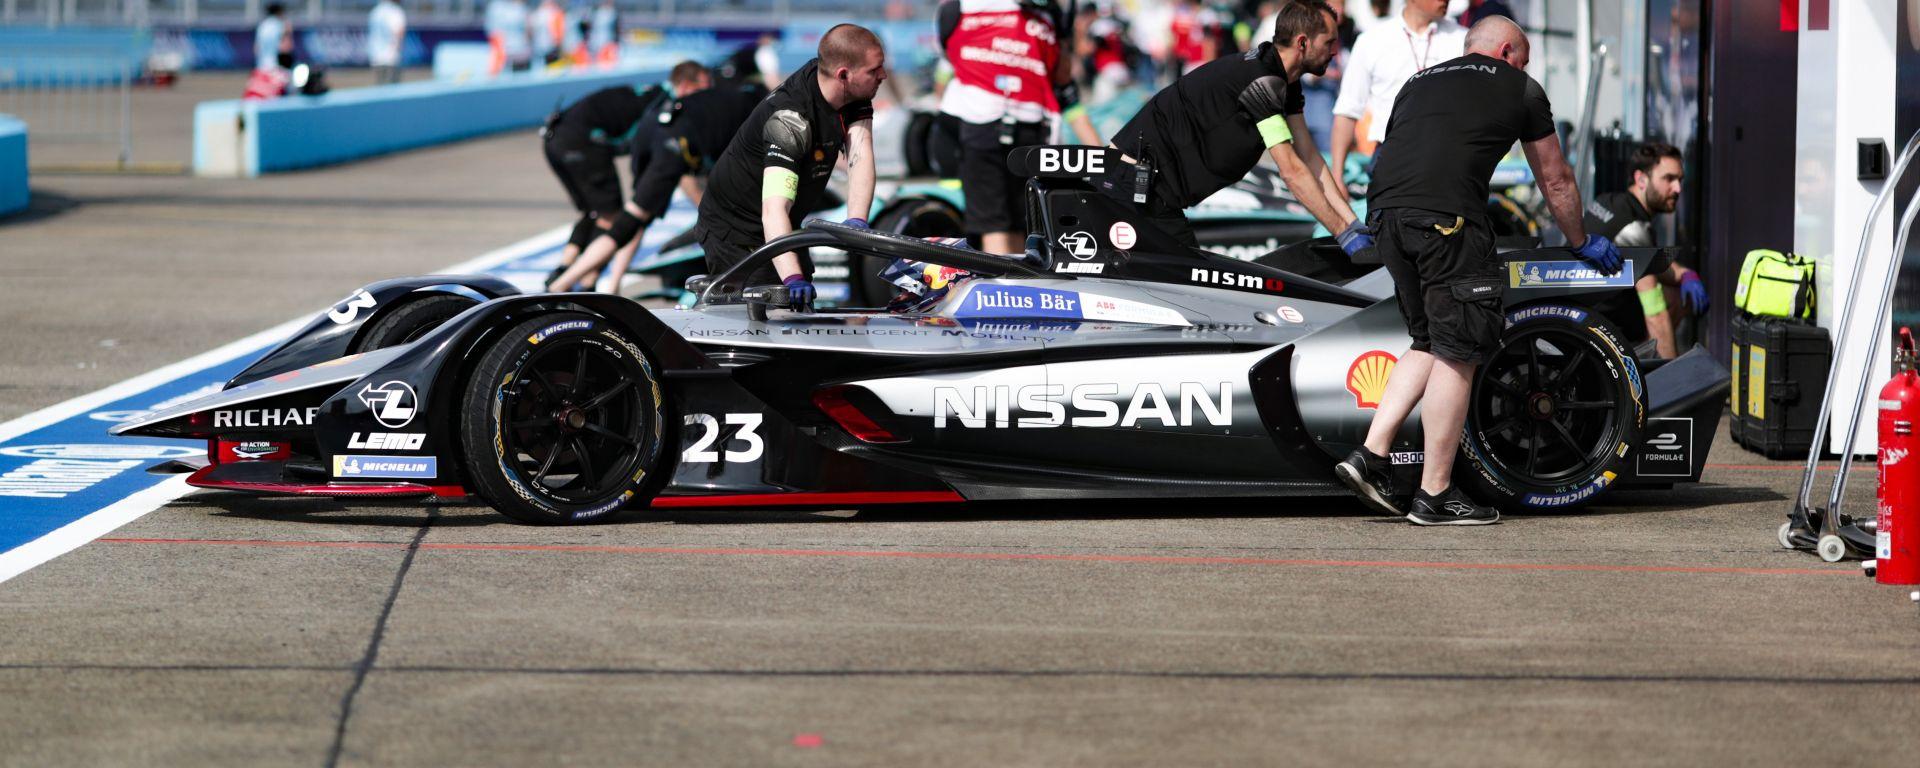 ePrix Berlino 2019, è Sebastien Buemi il poleman